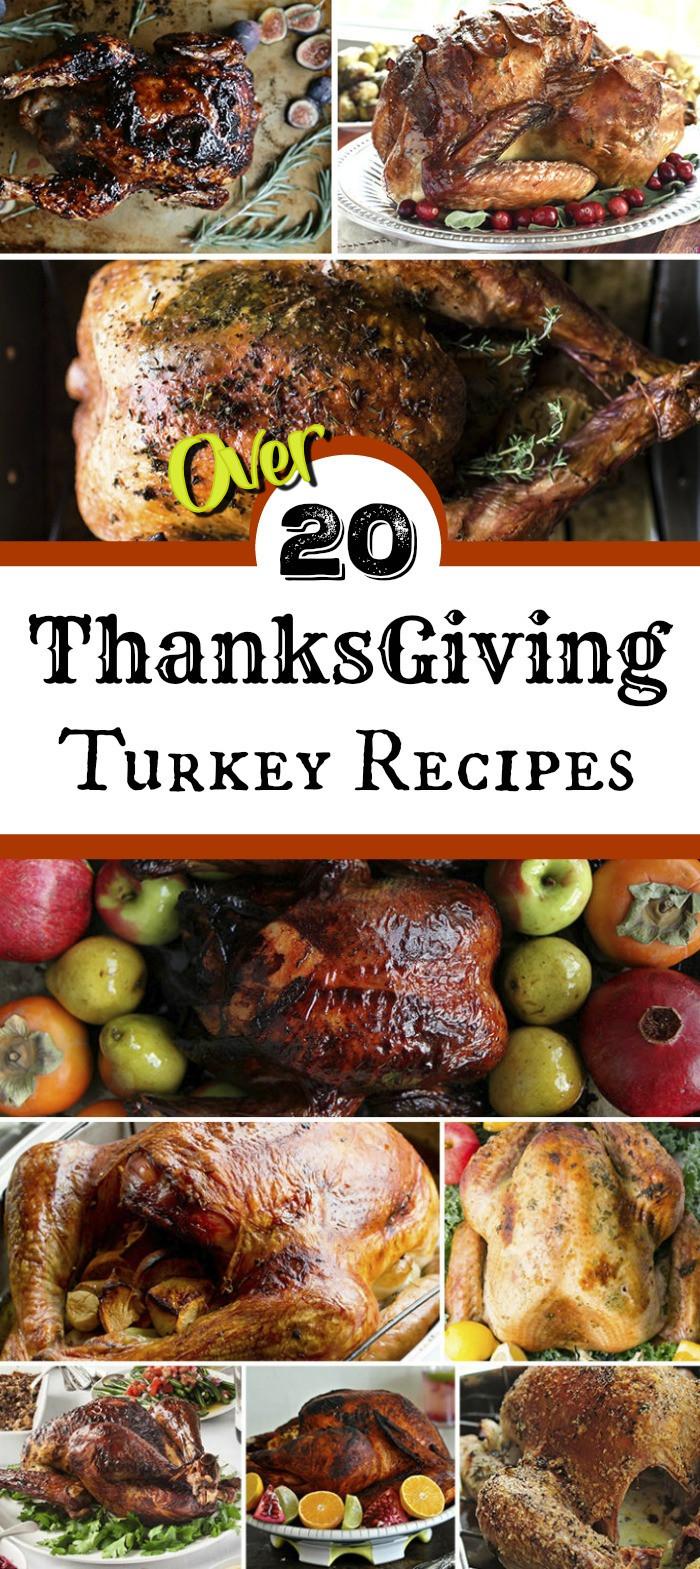 Recipes For Thanksgiving Turkey  Thanksgiving Turkey Recipes for the Best Thanksgiving